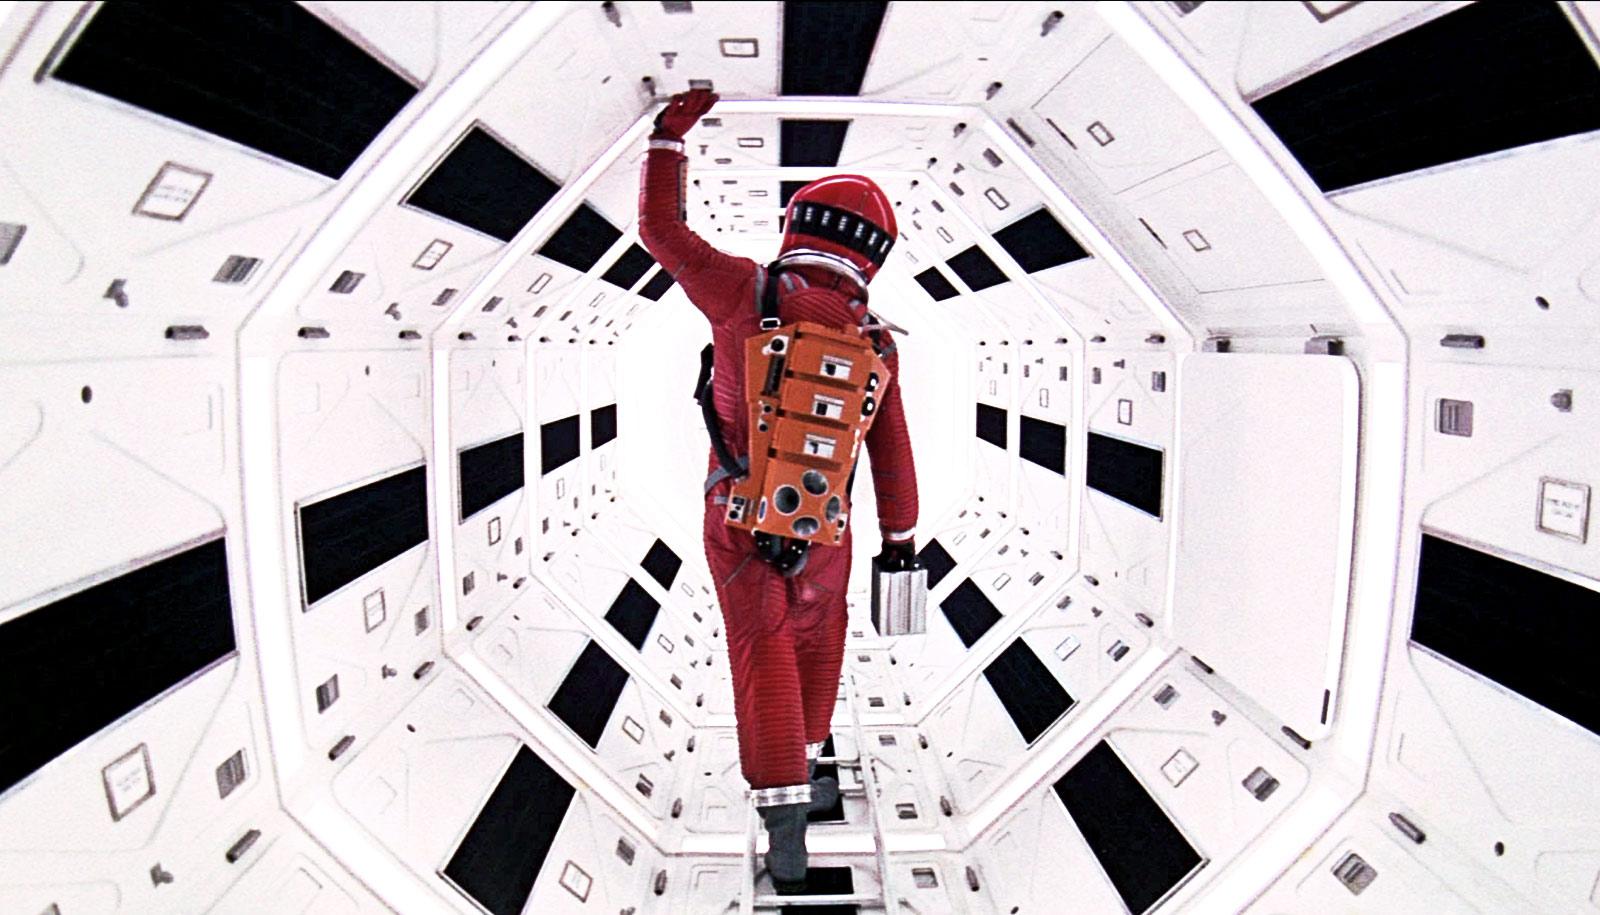 2001: A Space Odyssey, 2001: Kosmosa odiseja